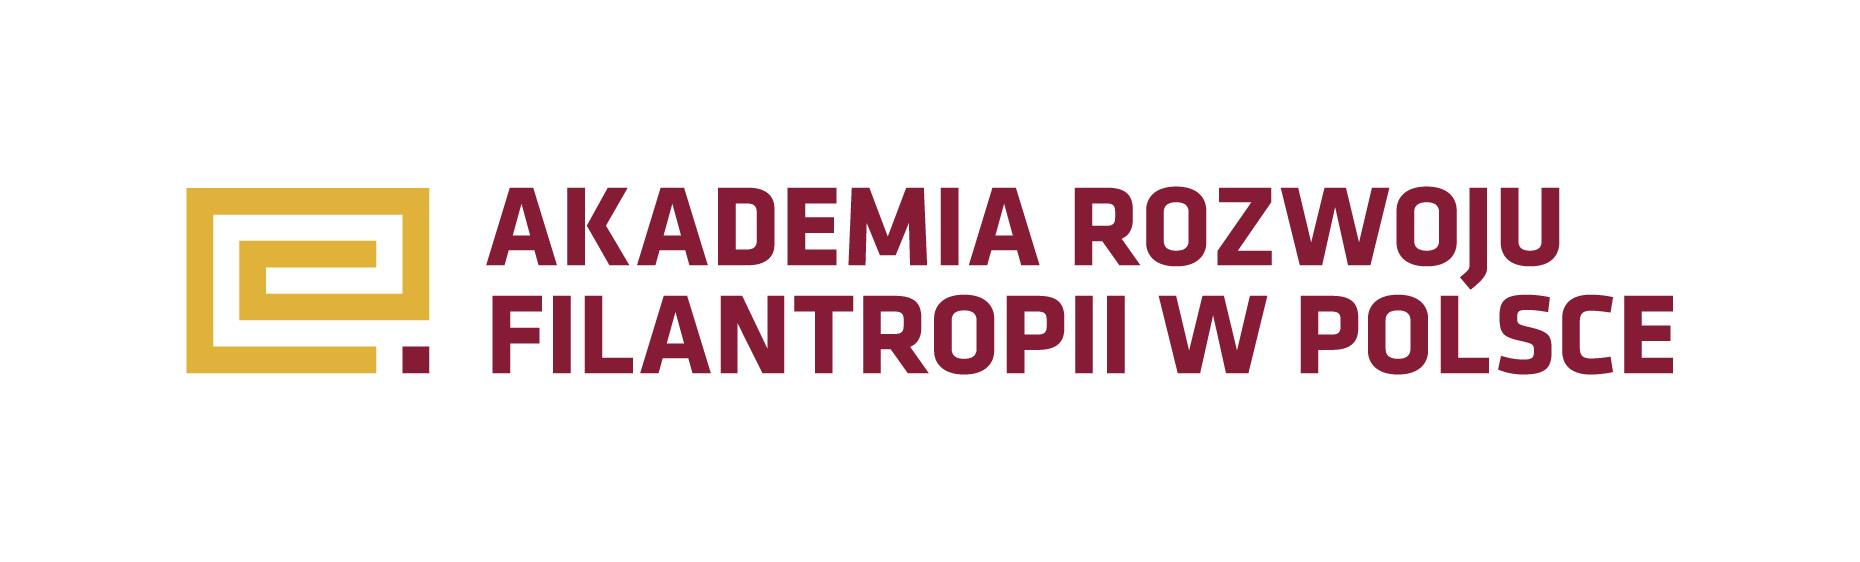 Akademia-Rozwoju-Filantropii